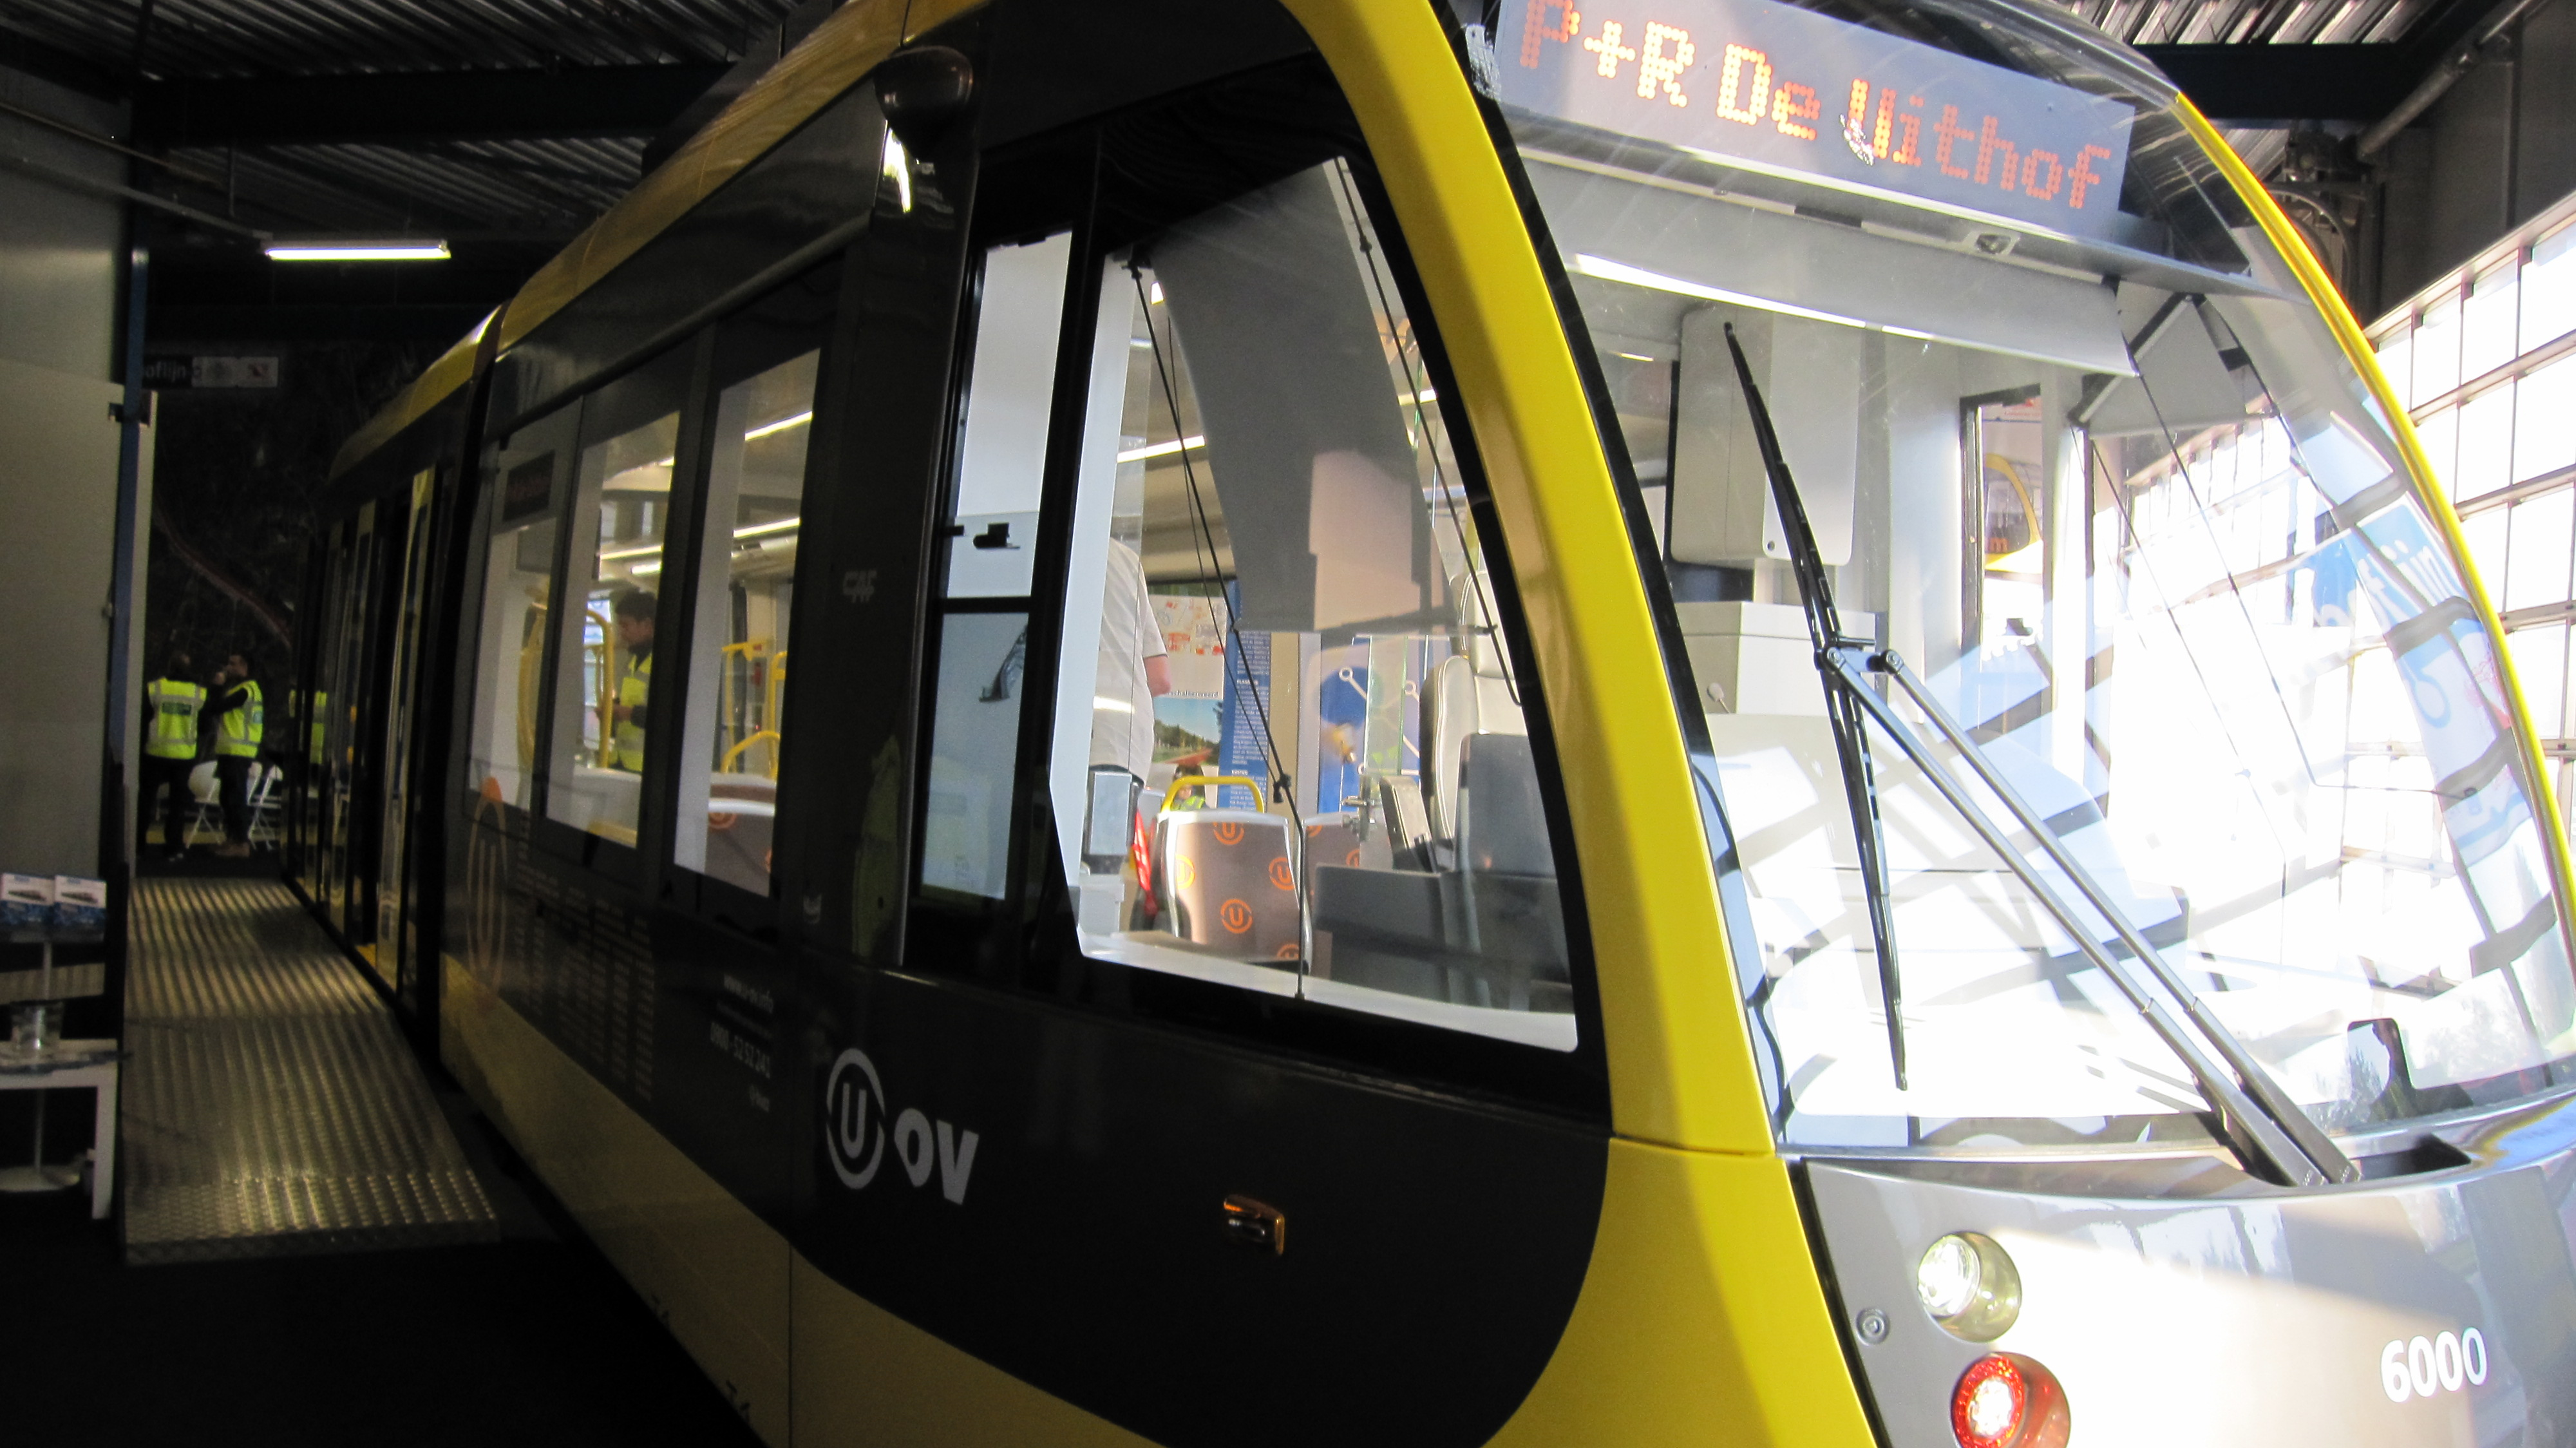 Bestand interieur mock up tram uithoflijn 1 jpg wikipedia for Interieur up